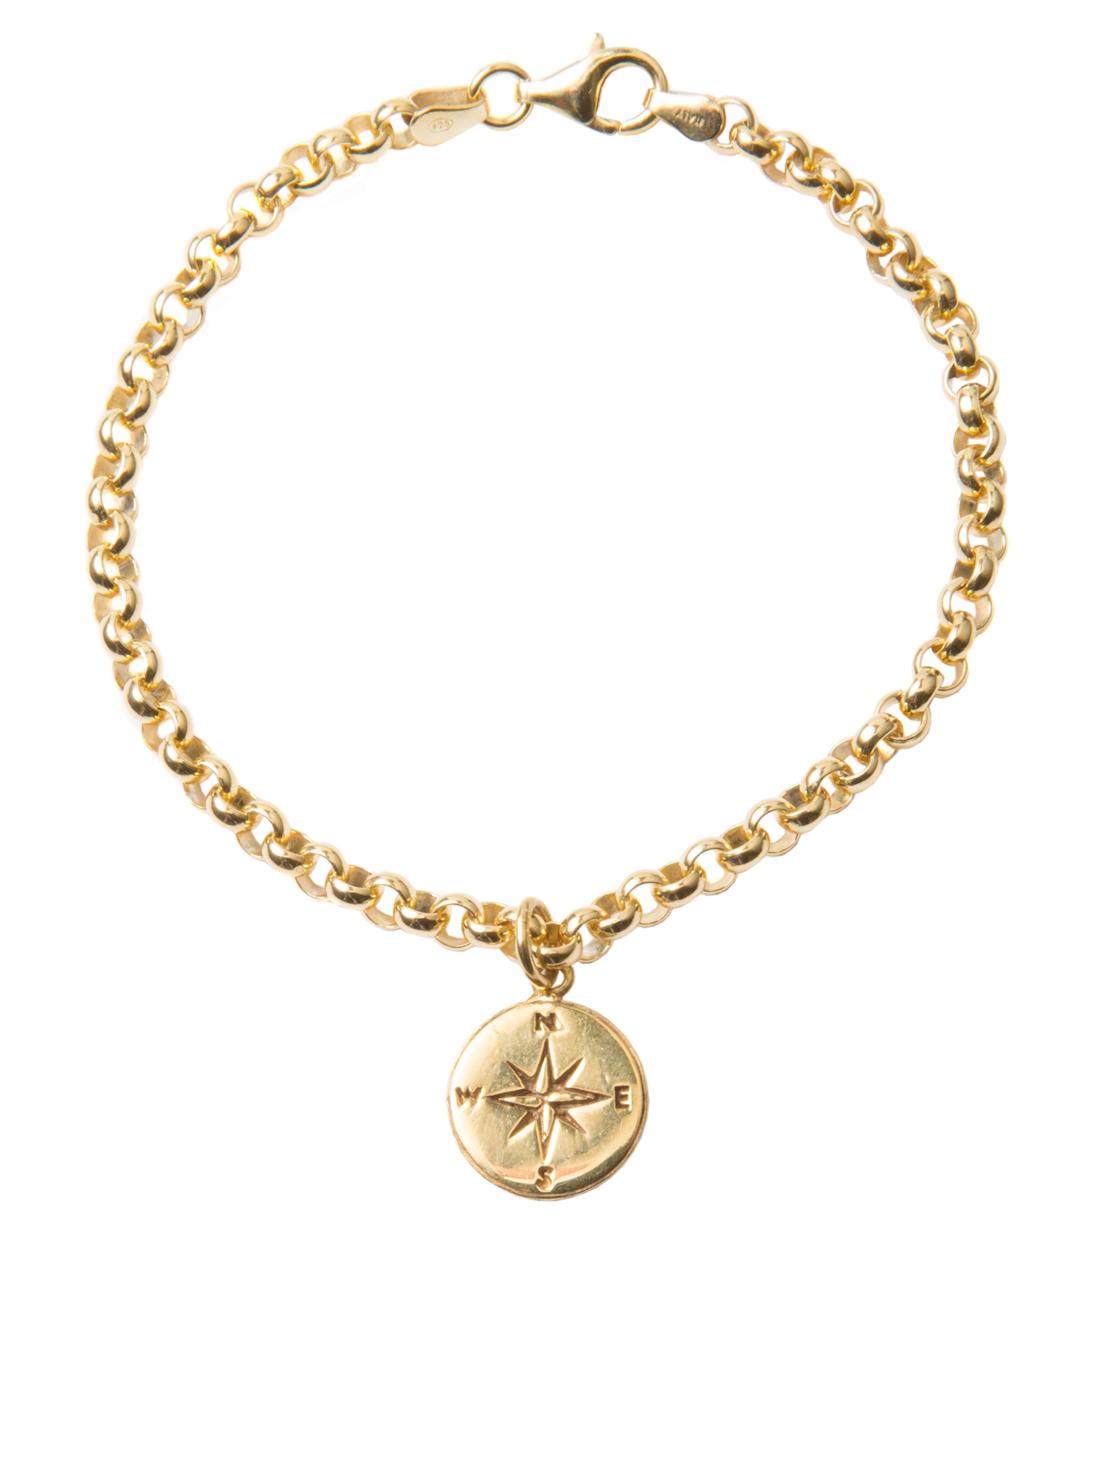 Gold Compass Bracelet